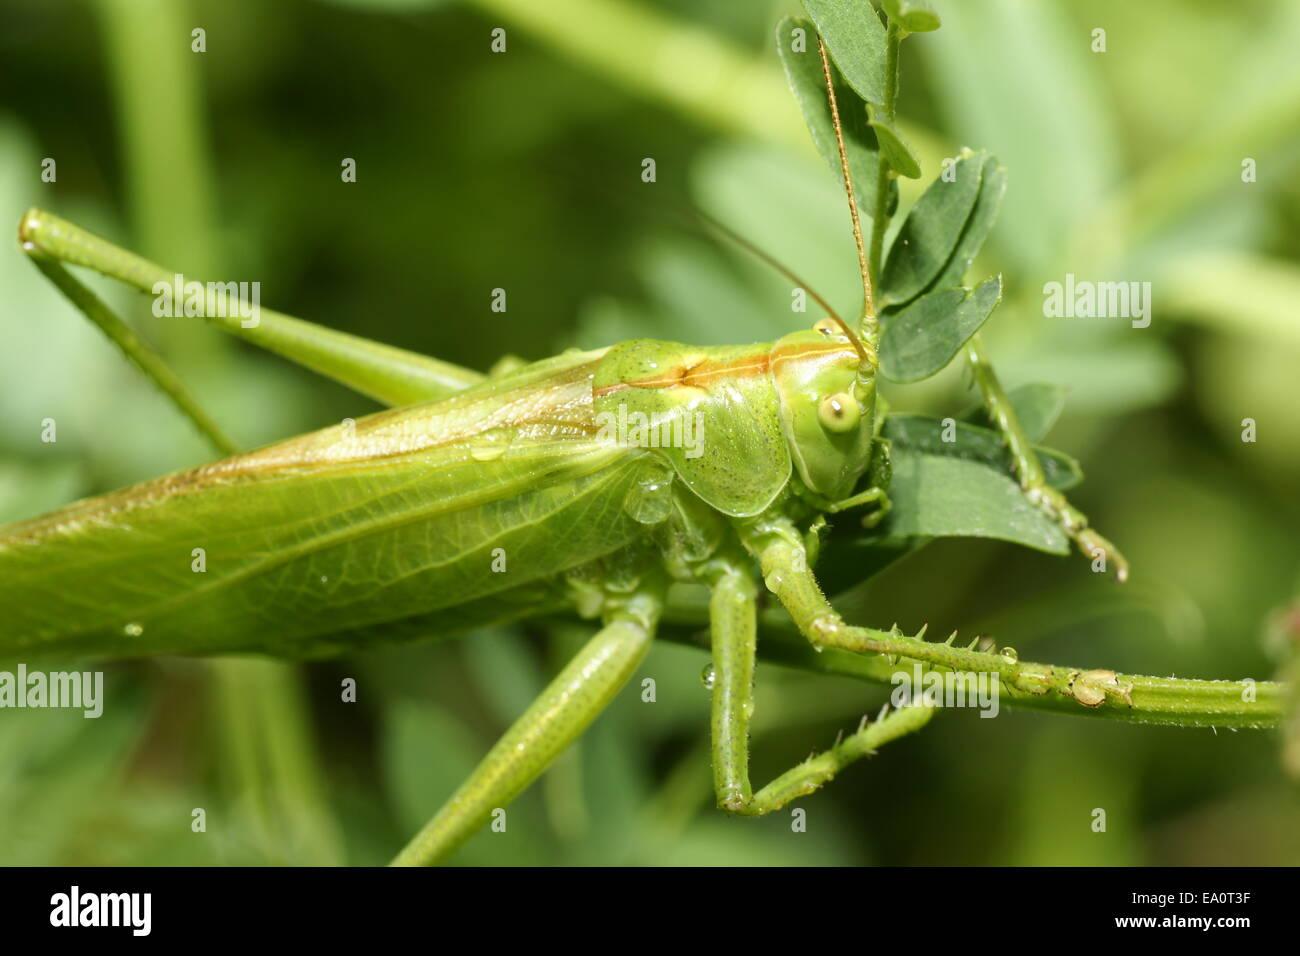 grüne Heuschrecke, Tettigonia viridissima Stockbild